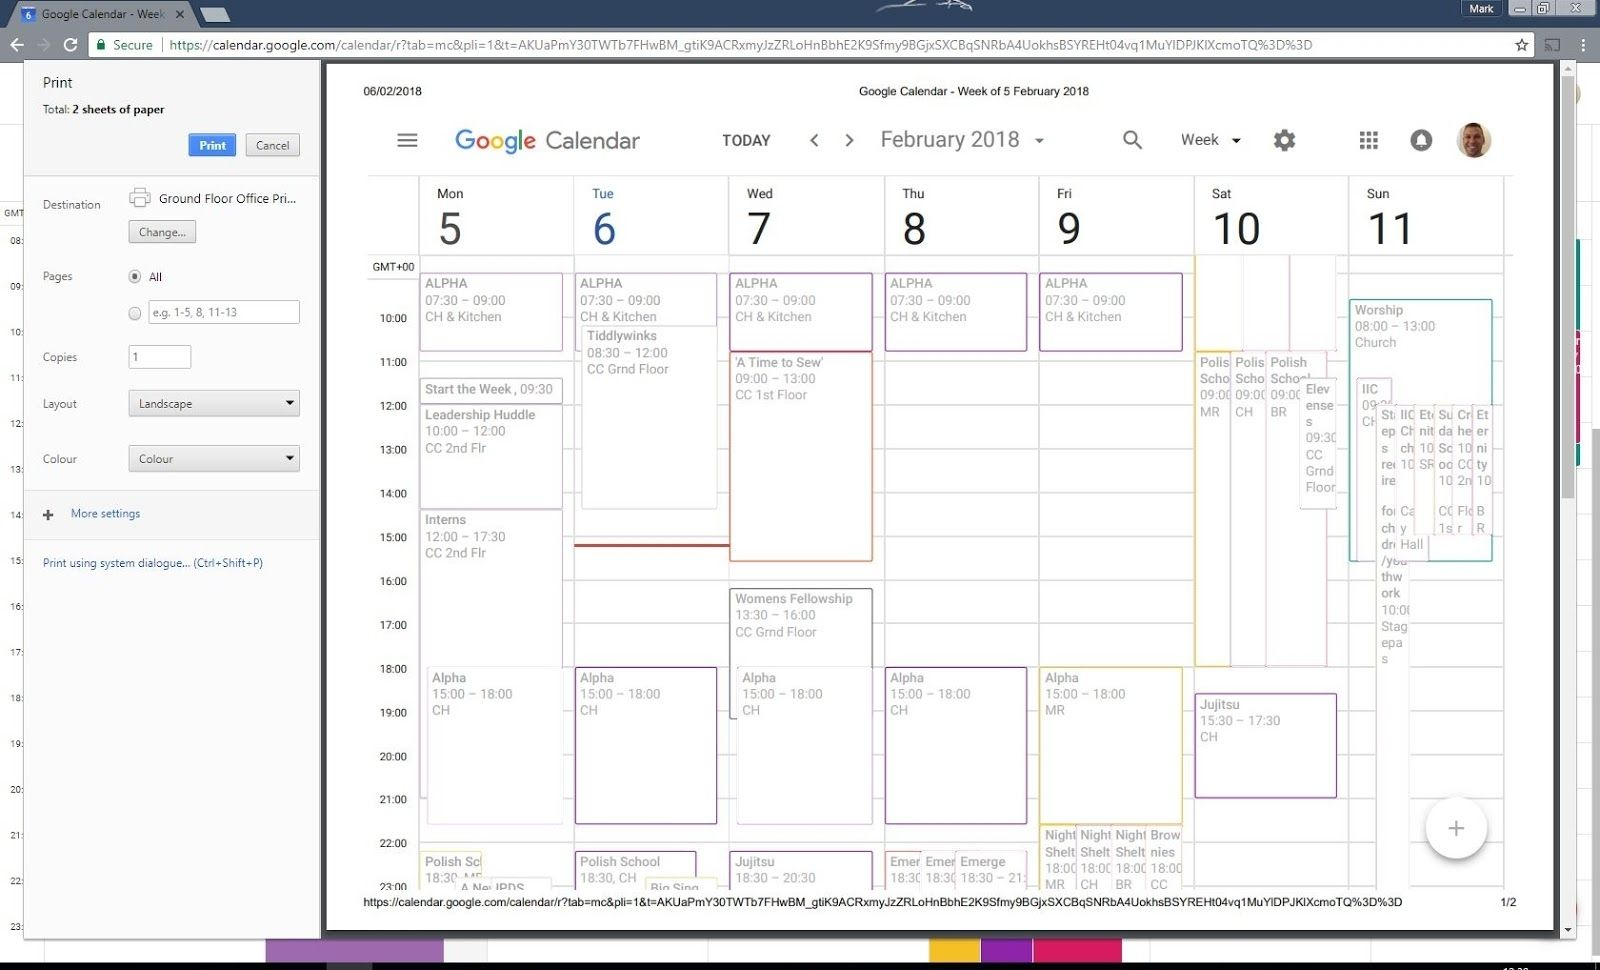 Can I Print Google Calendar In 2020 | Google Calendar